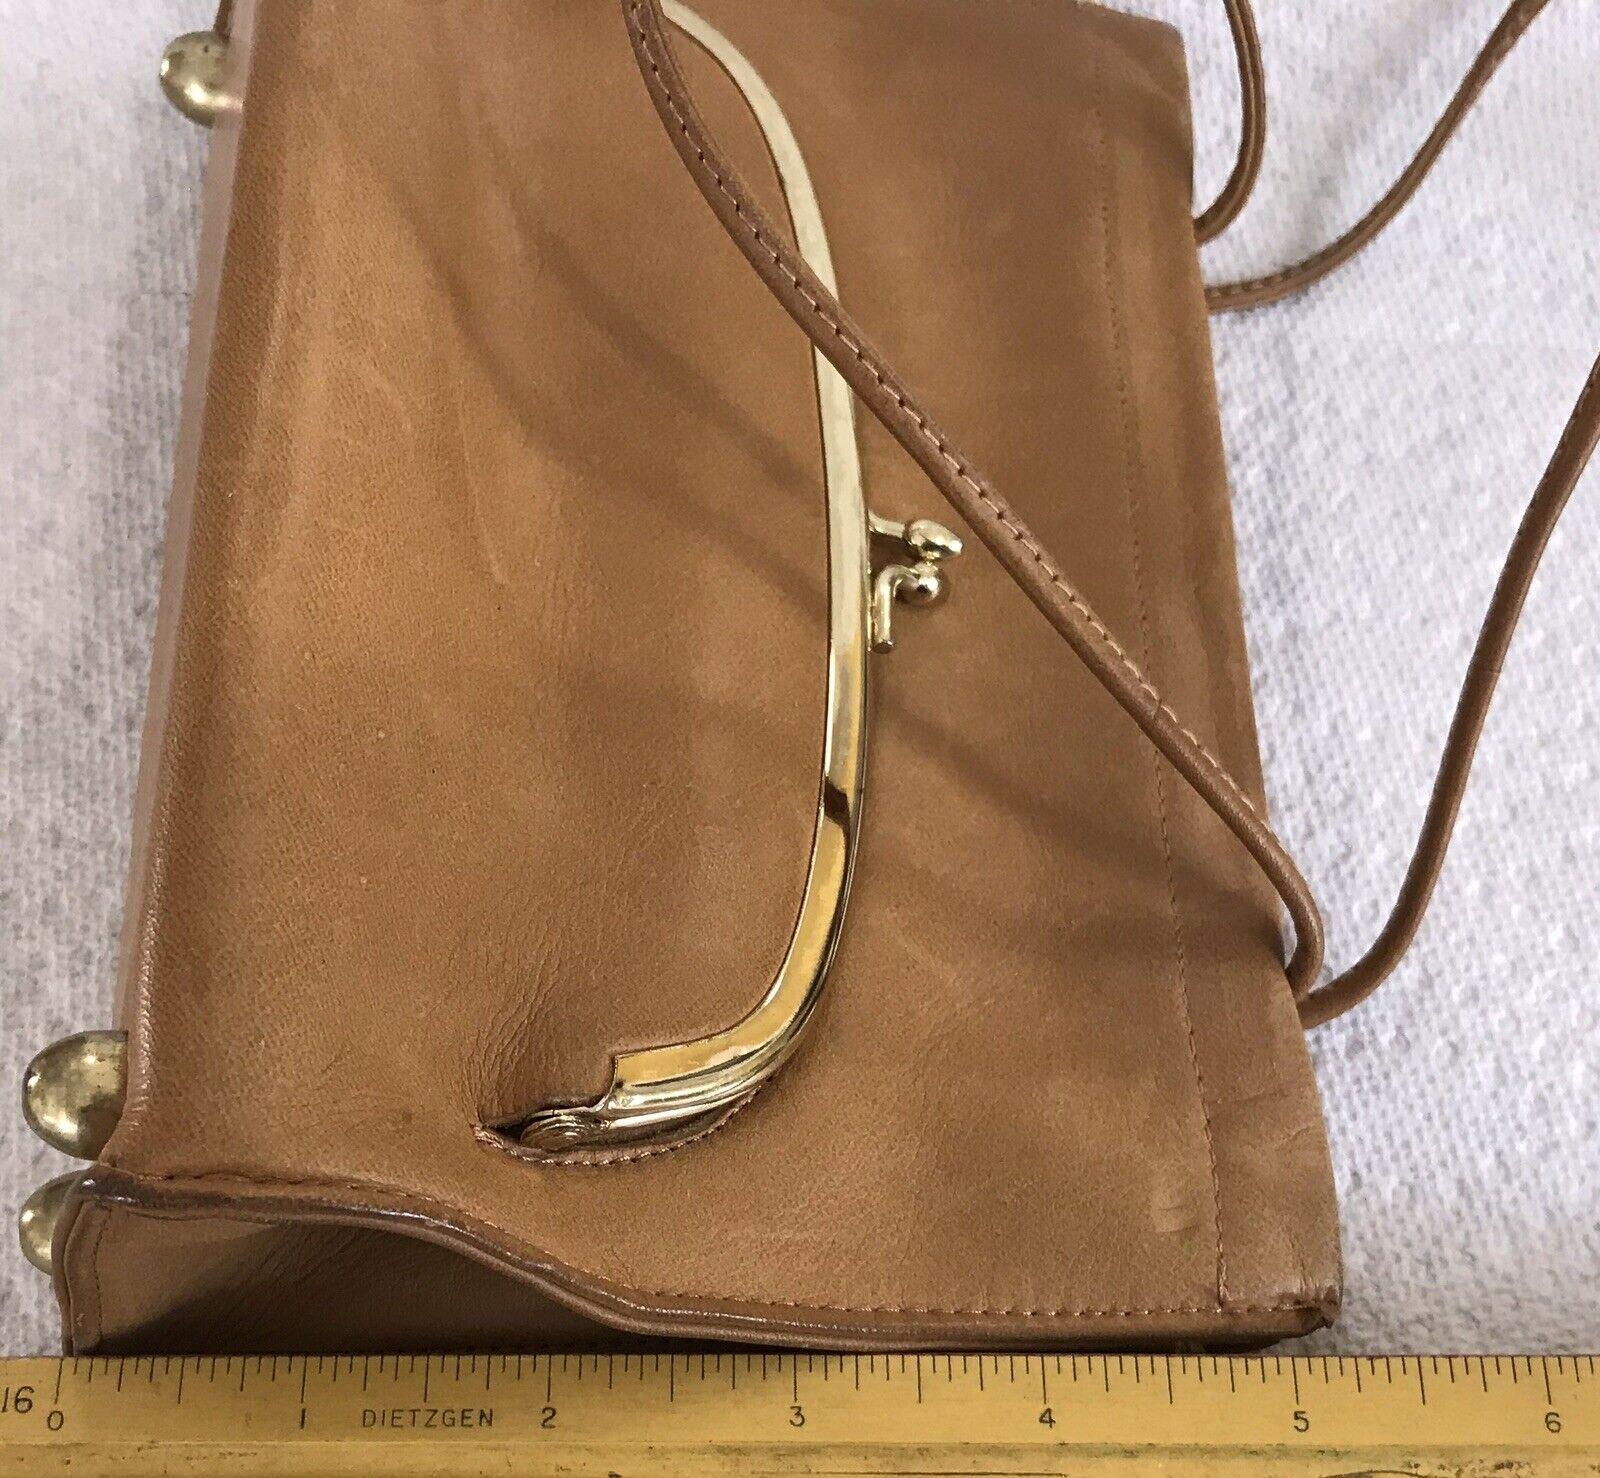 Vintage Coach Rare Leather Bonnie Cashin Stripe I… - image 12